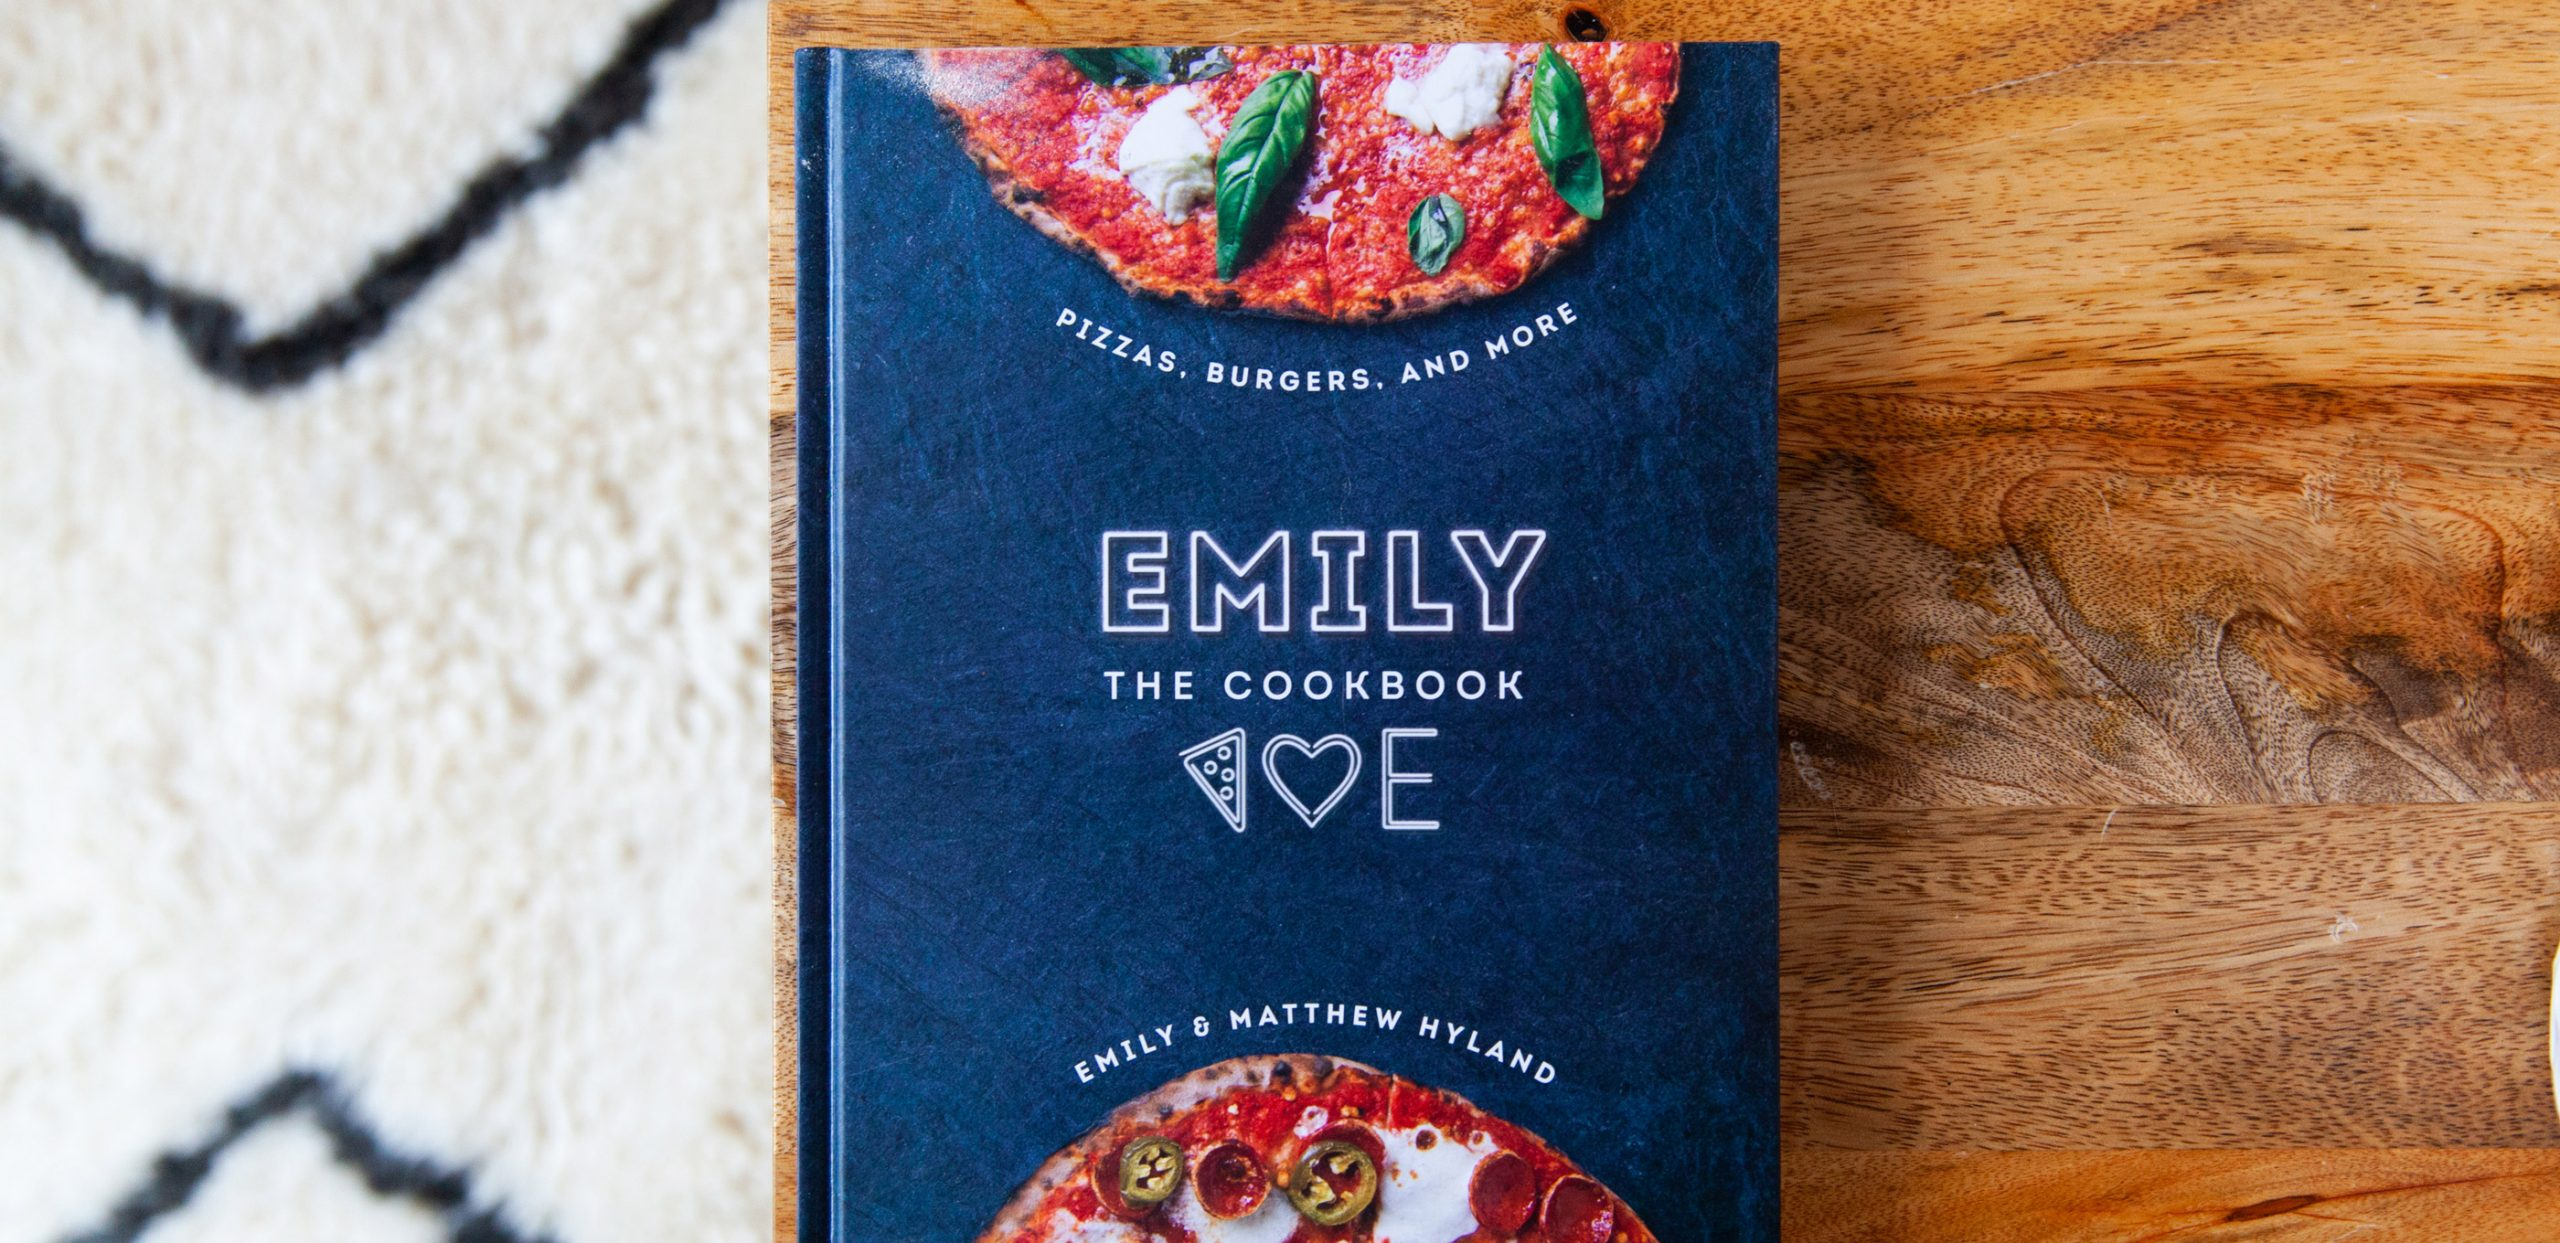 Emily, the Cookbook